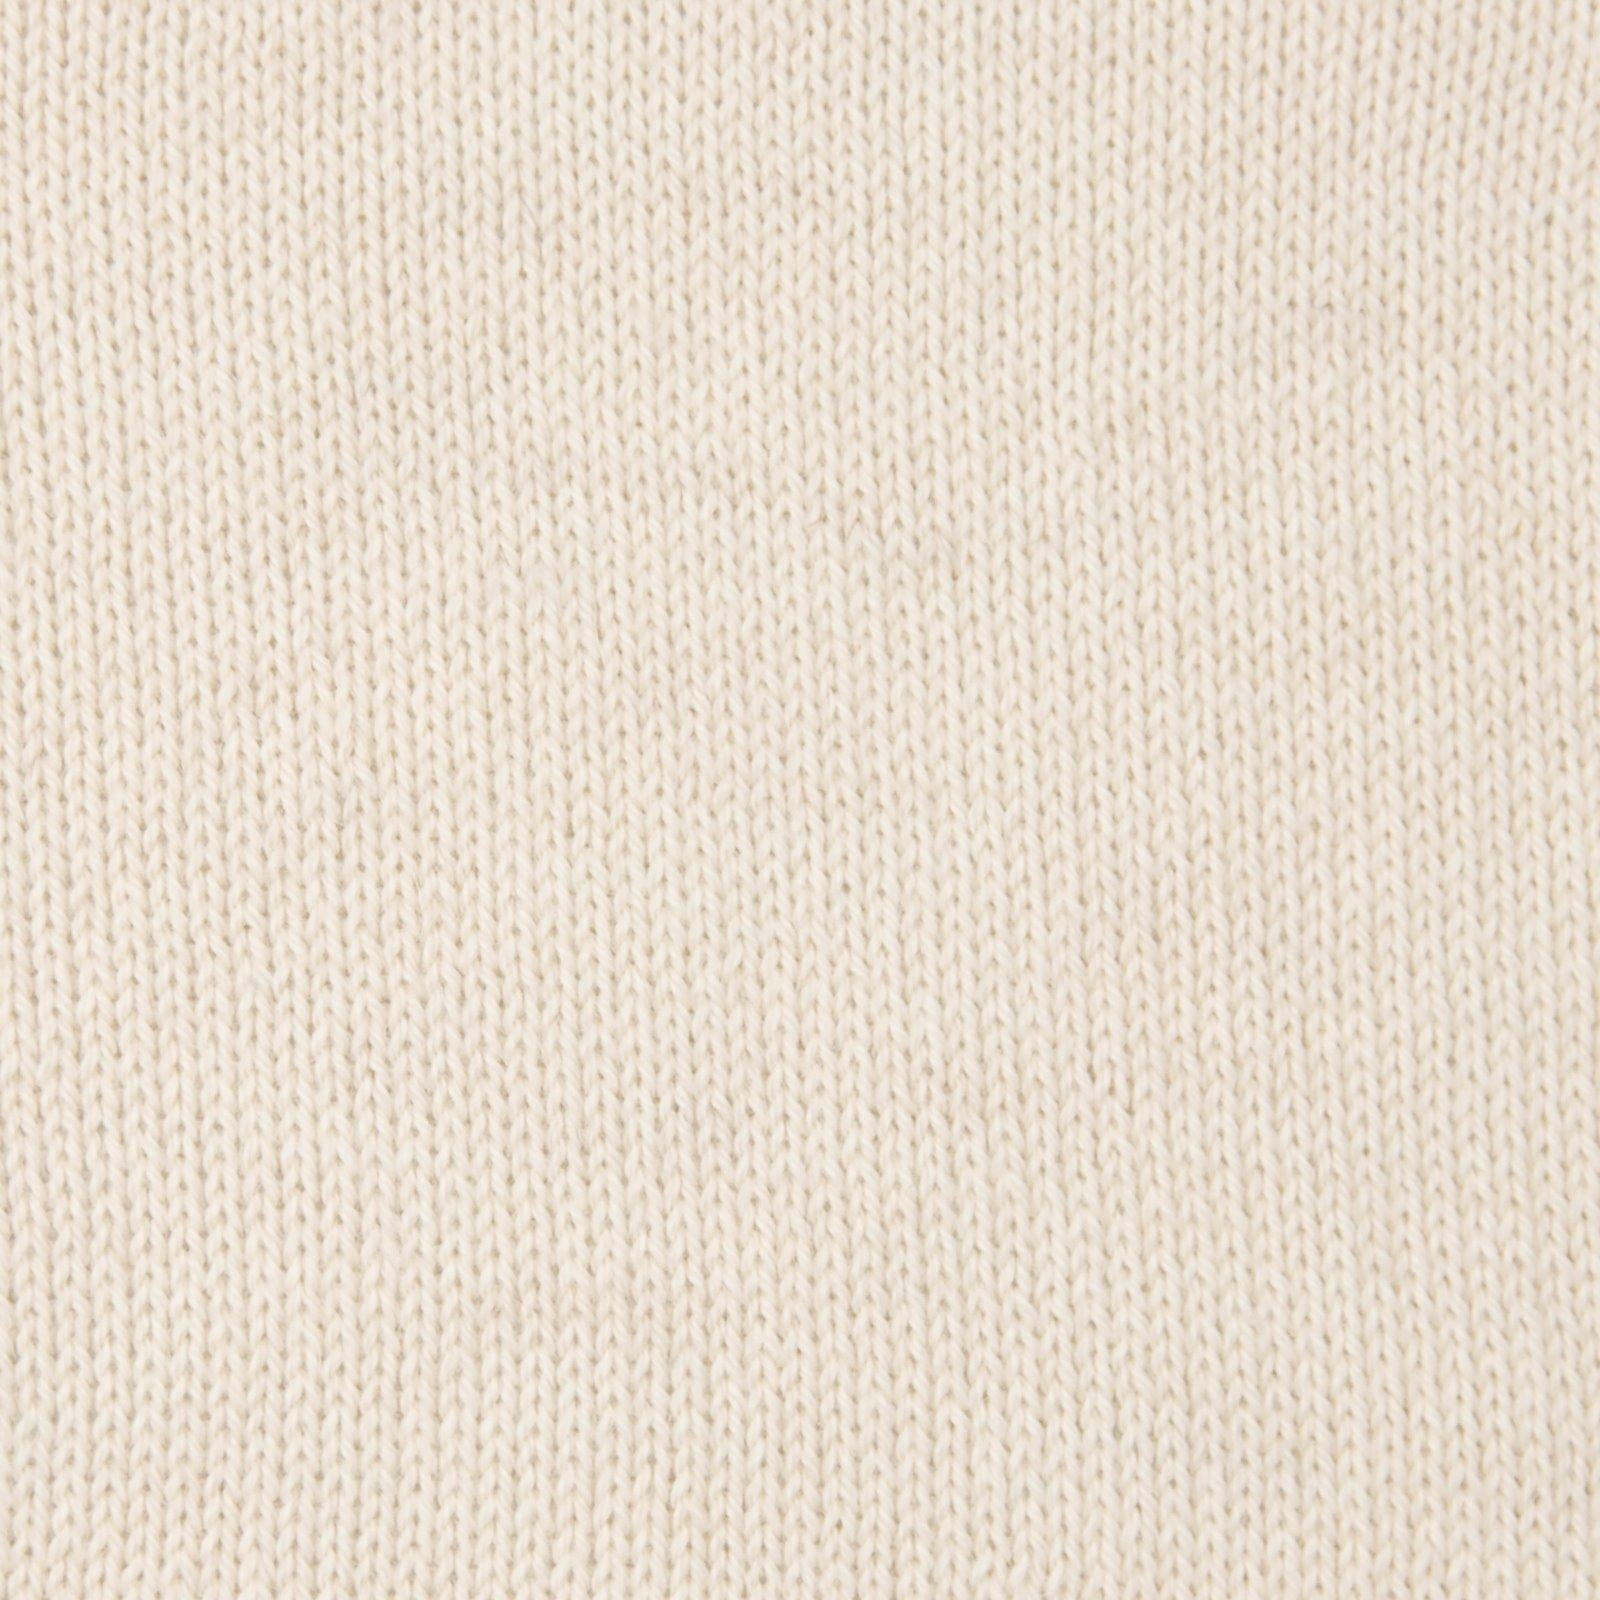 Woolly 50g light grey 90000069_90000070_90000071_90000073_90000079_90000080_sskit